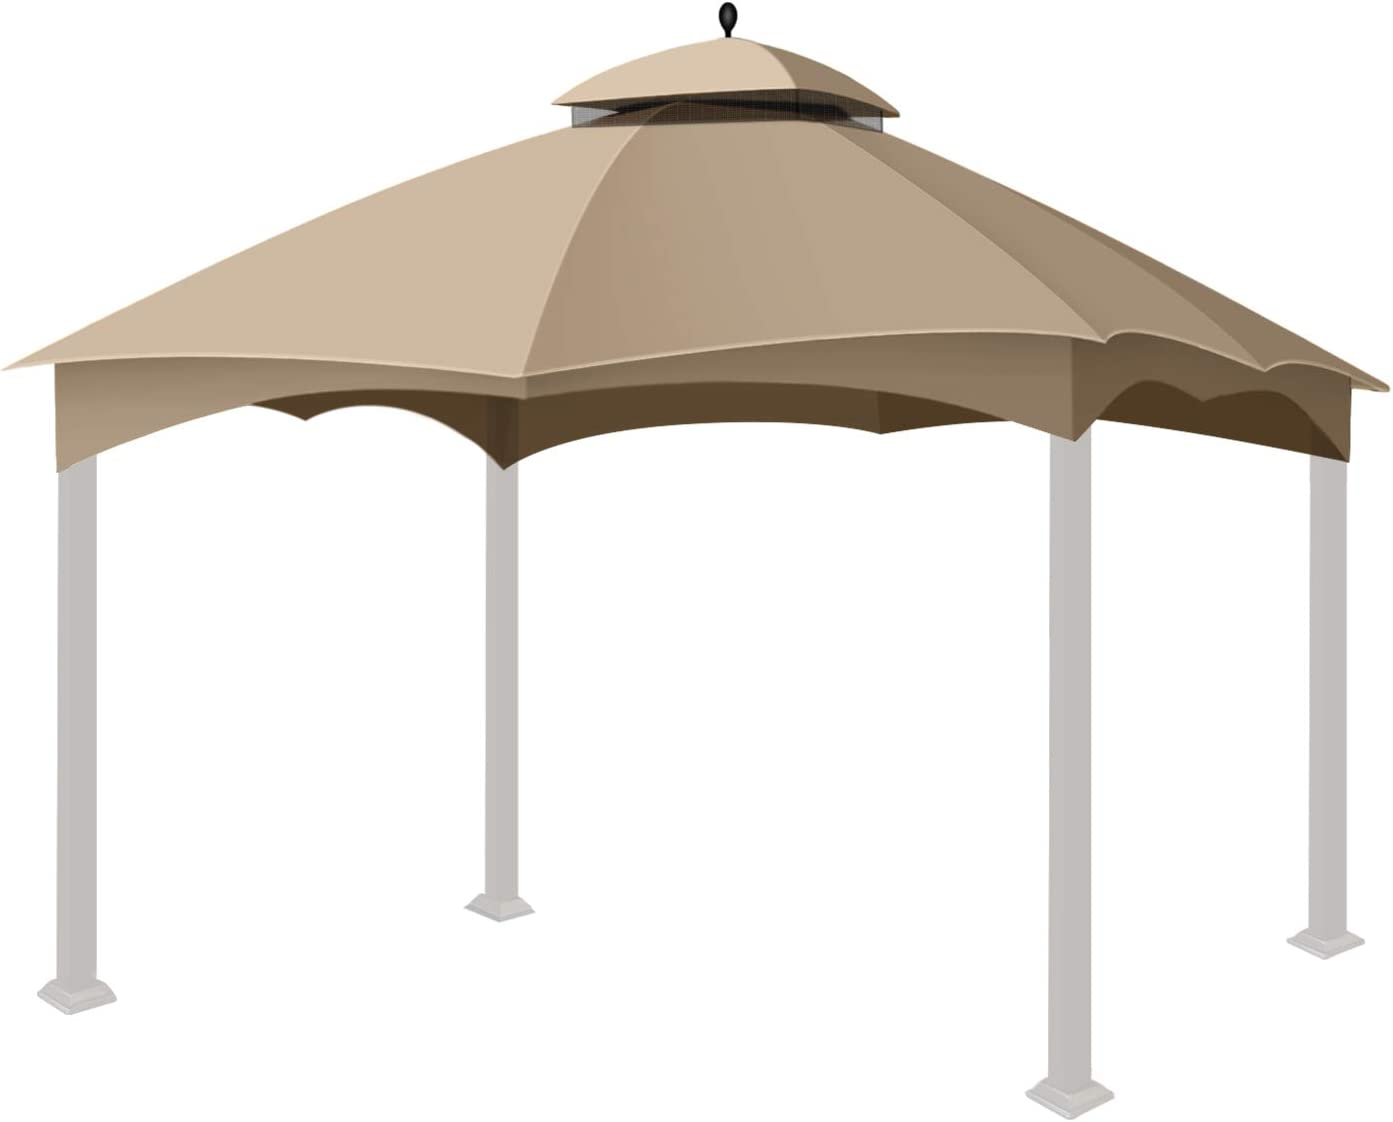 Flexzion Gazebo Replacement Canopy Top Tent for Lowe's Home Depot Allen & Roth 10 X 12 Feet UV UPF 50+ Dual Tier Plain Edge Water-Resistant Cover Shade Outdoor Garden Backyard Patio Gazebo, Beige